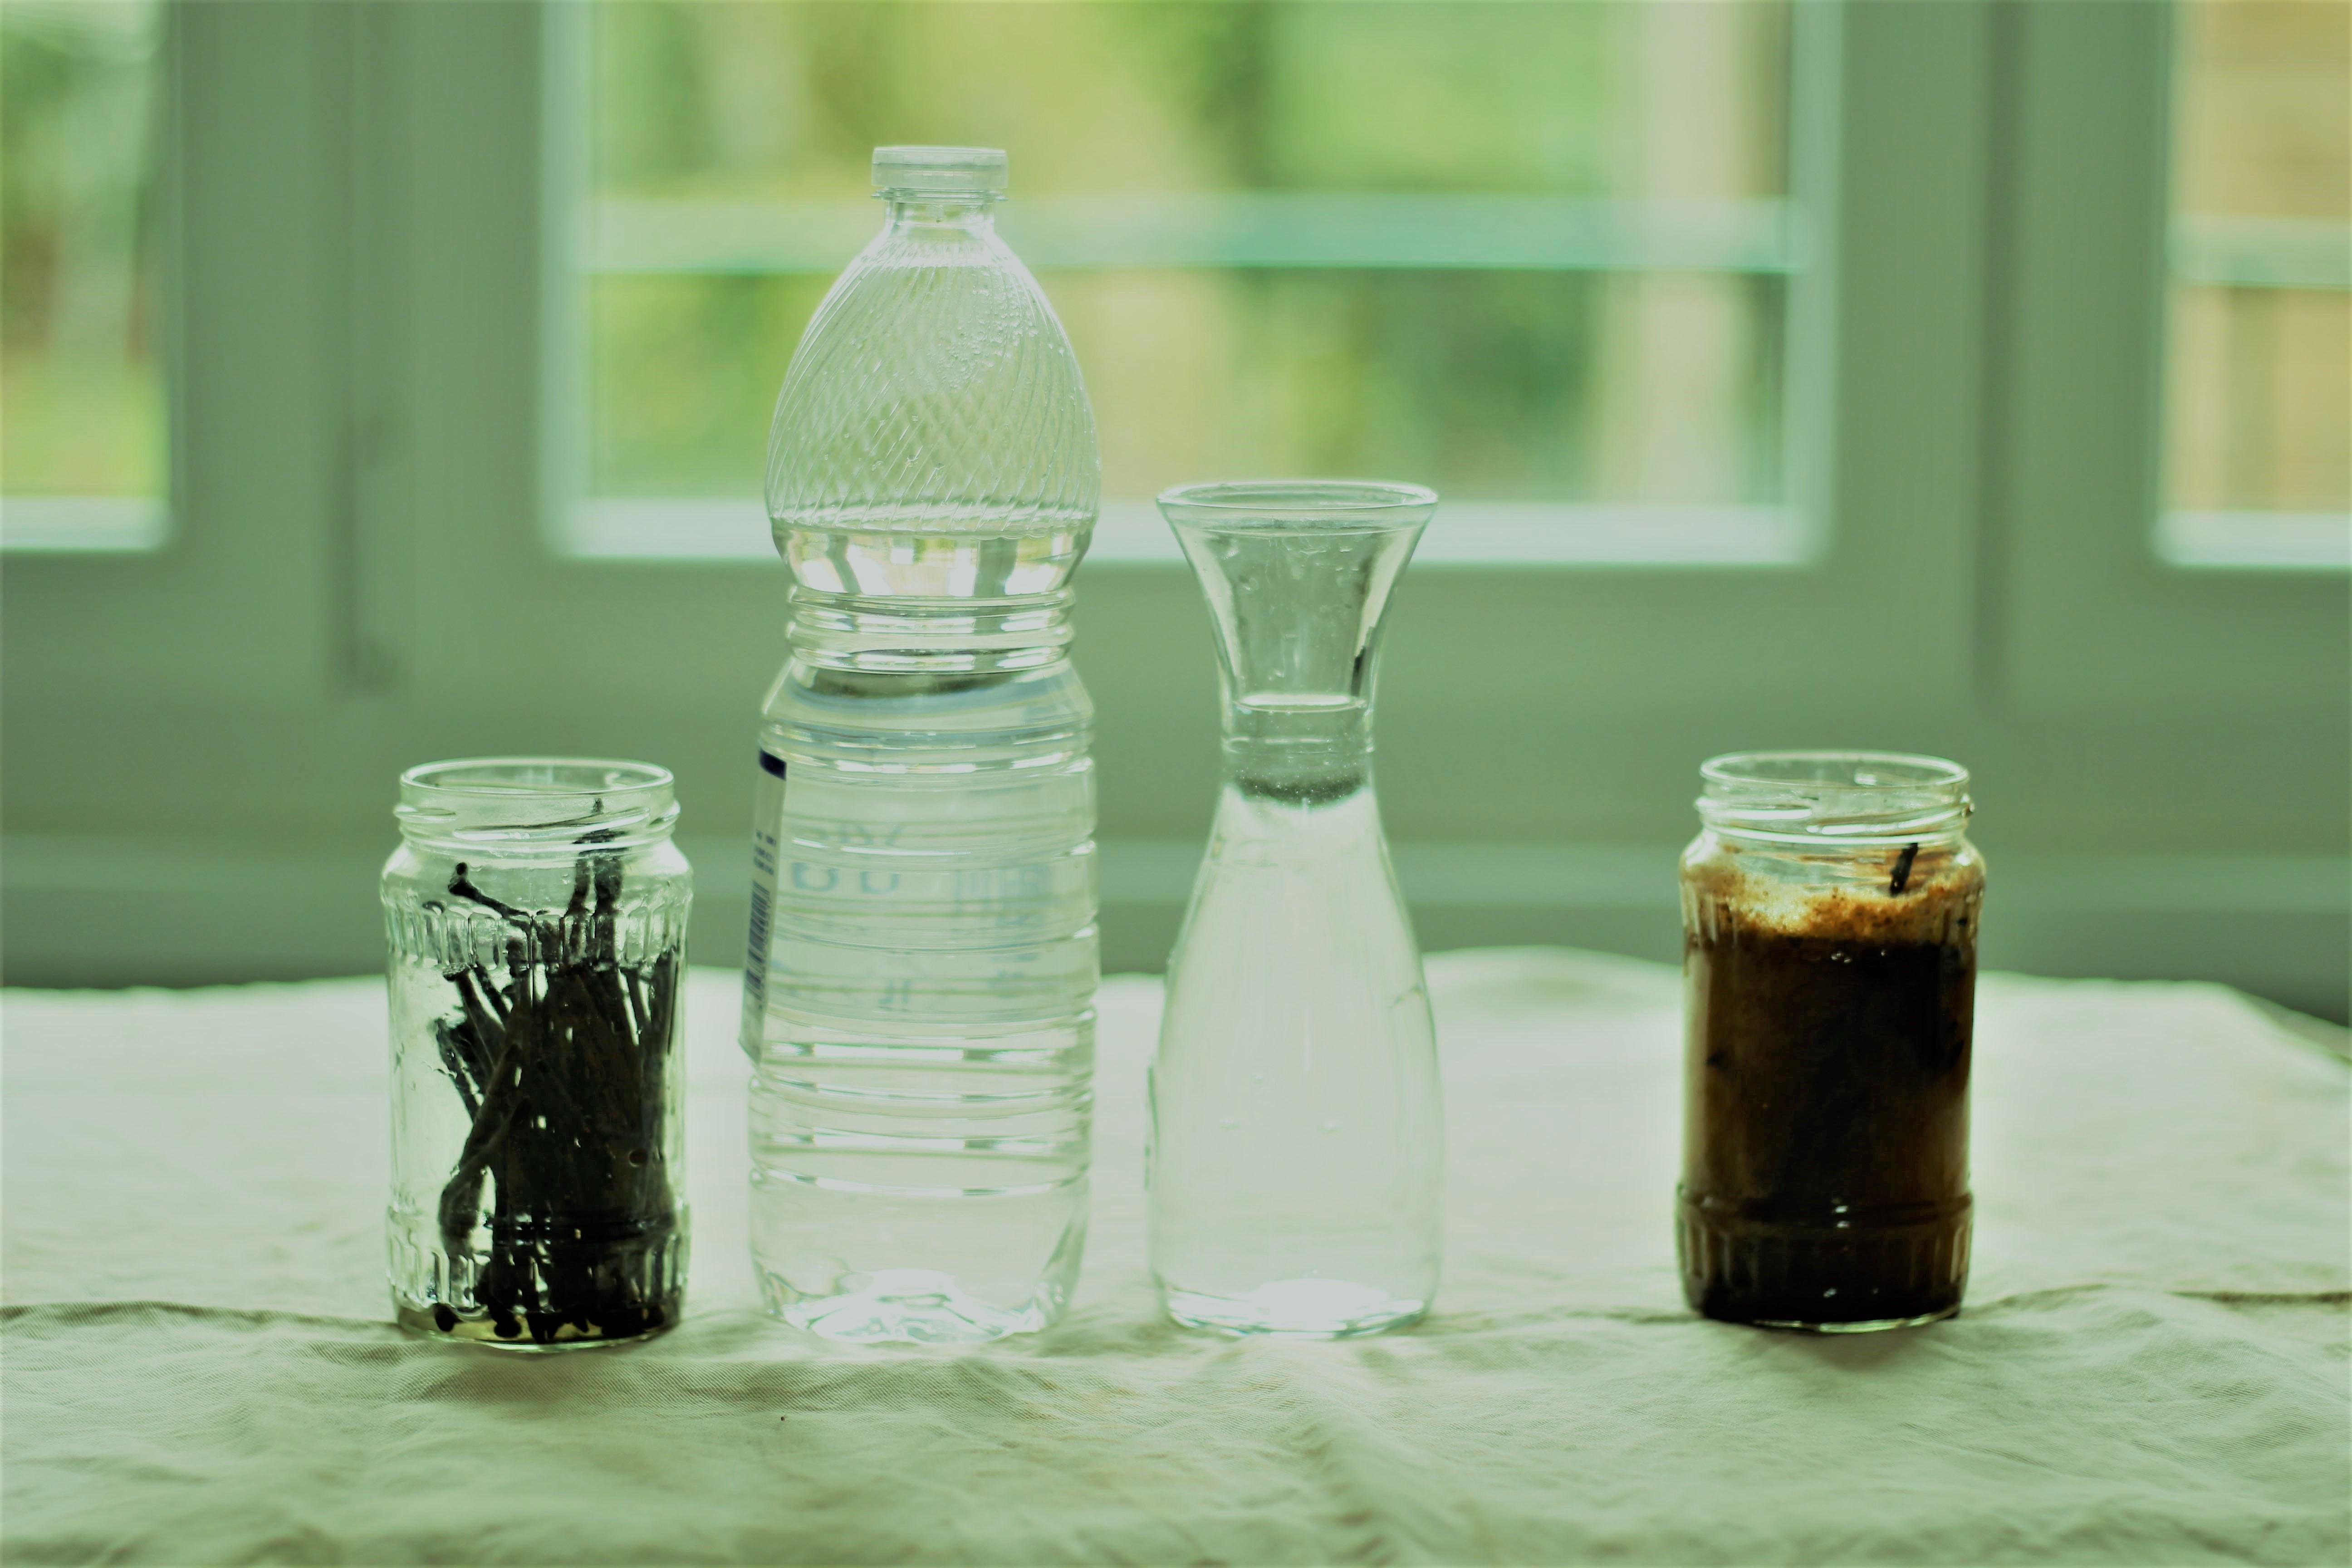 claudialeclercq-dusoleildanslenord-naturaldyeing-tintesnaturales-ironwater-solalnorte-3 (2)